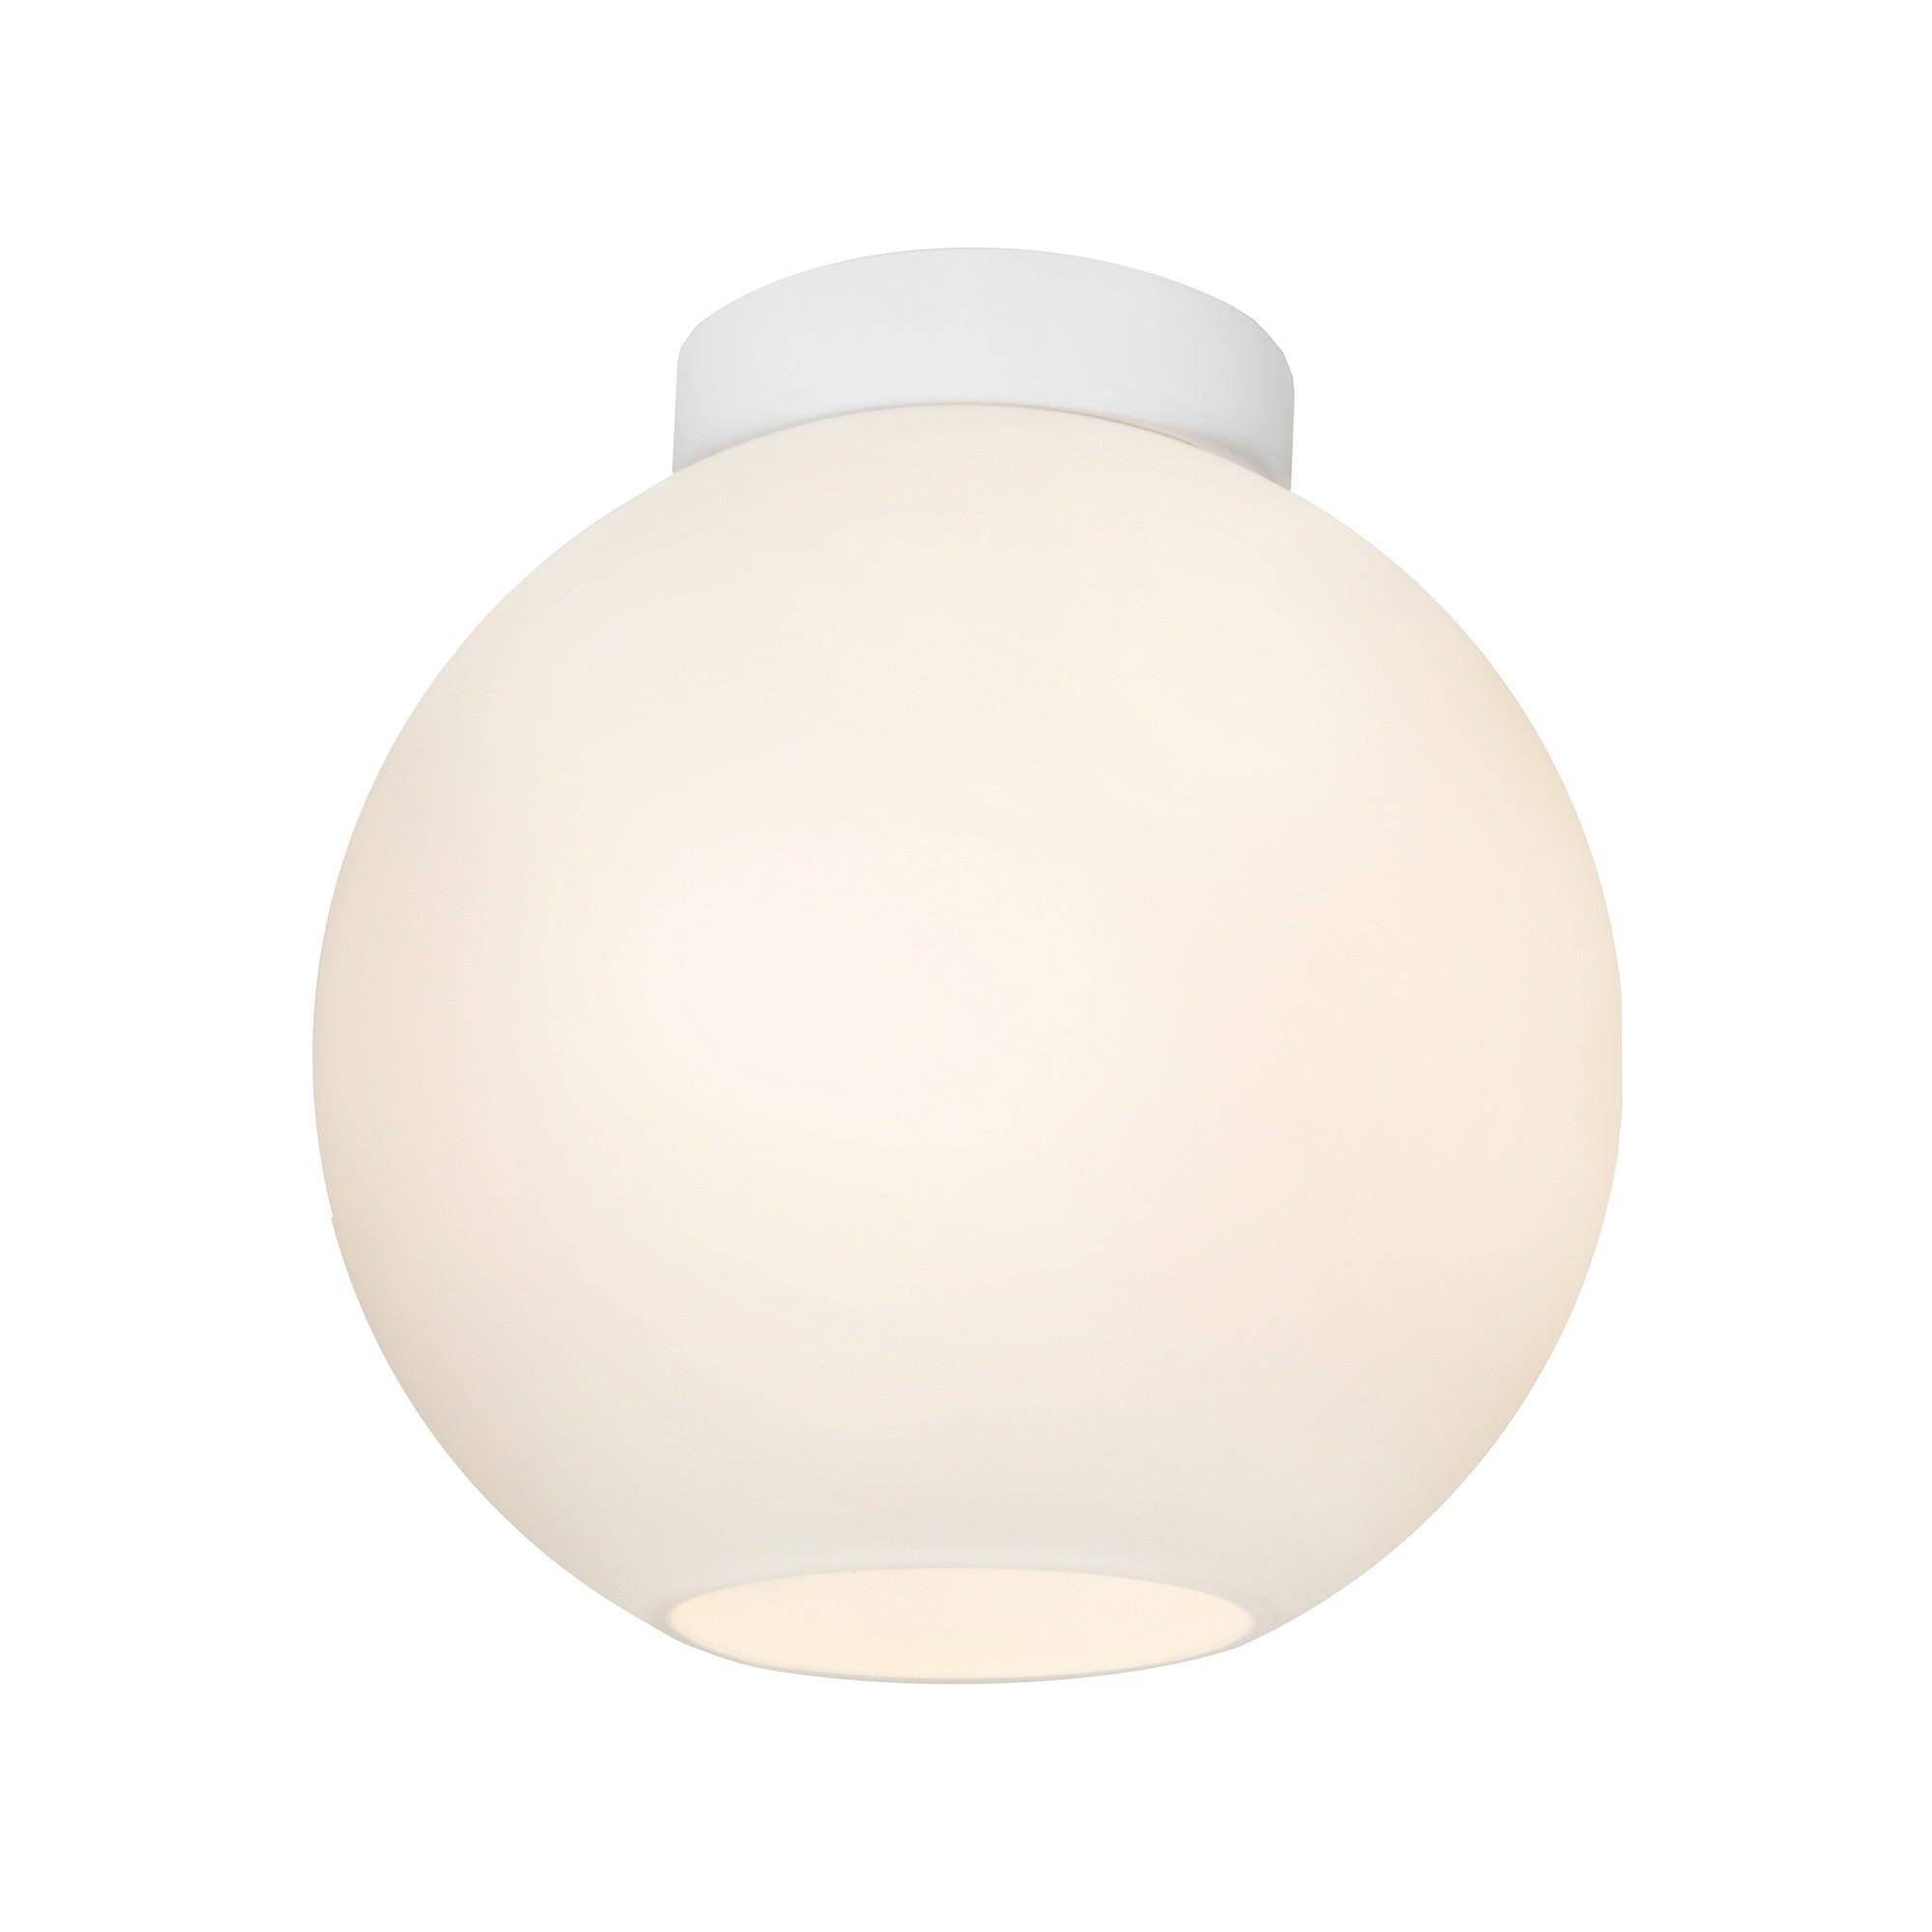 Orpheus Glass Batten Fix Ceiling Light, Opal / White